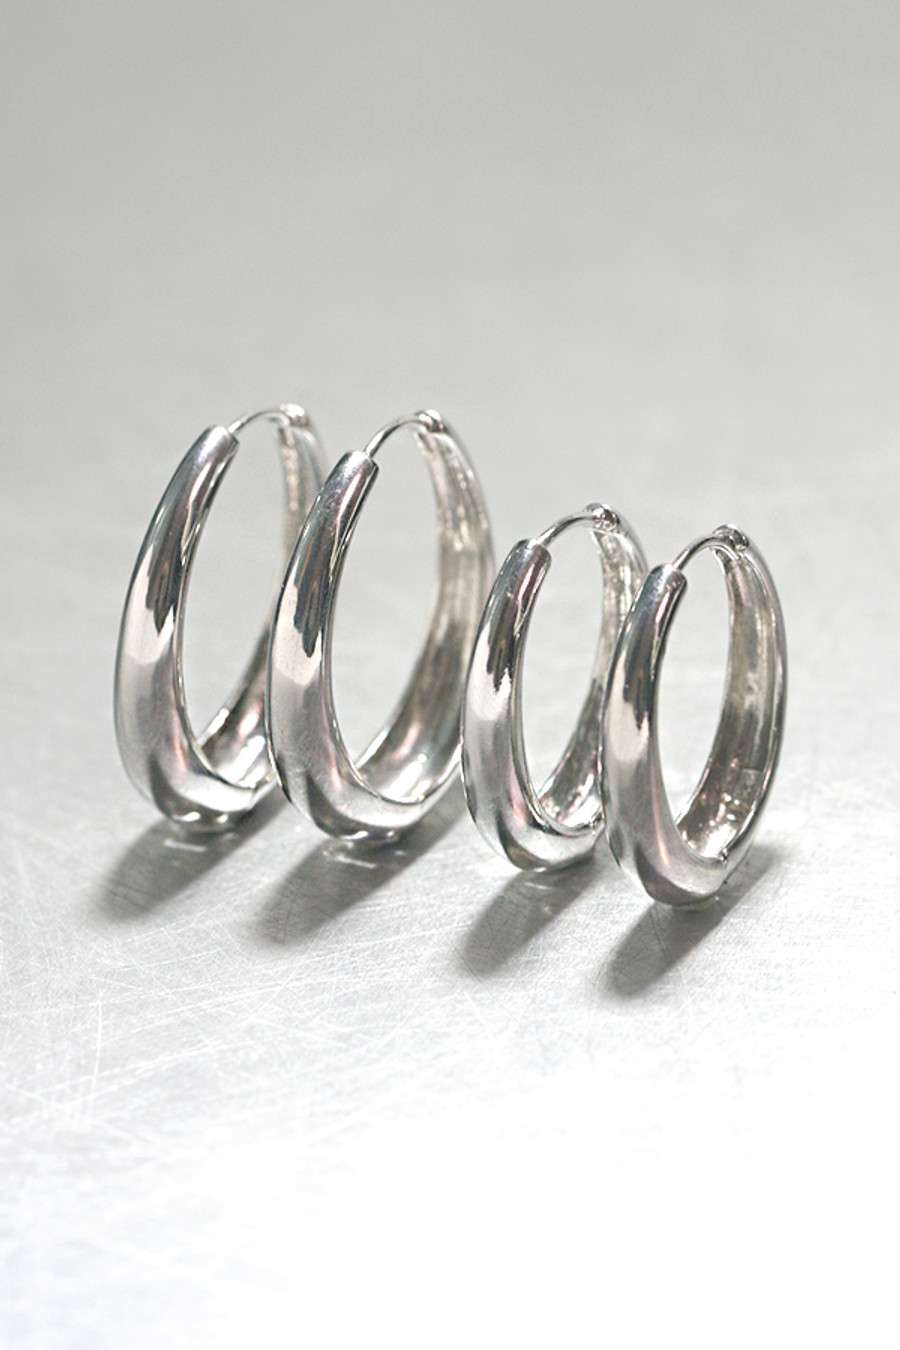 left 30mm, right 25mm - sterling Silver Hinge Oval Hoop Earrings 25mm from kellinsilver.com